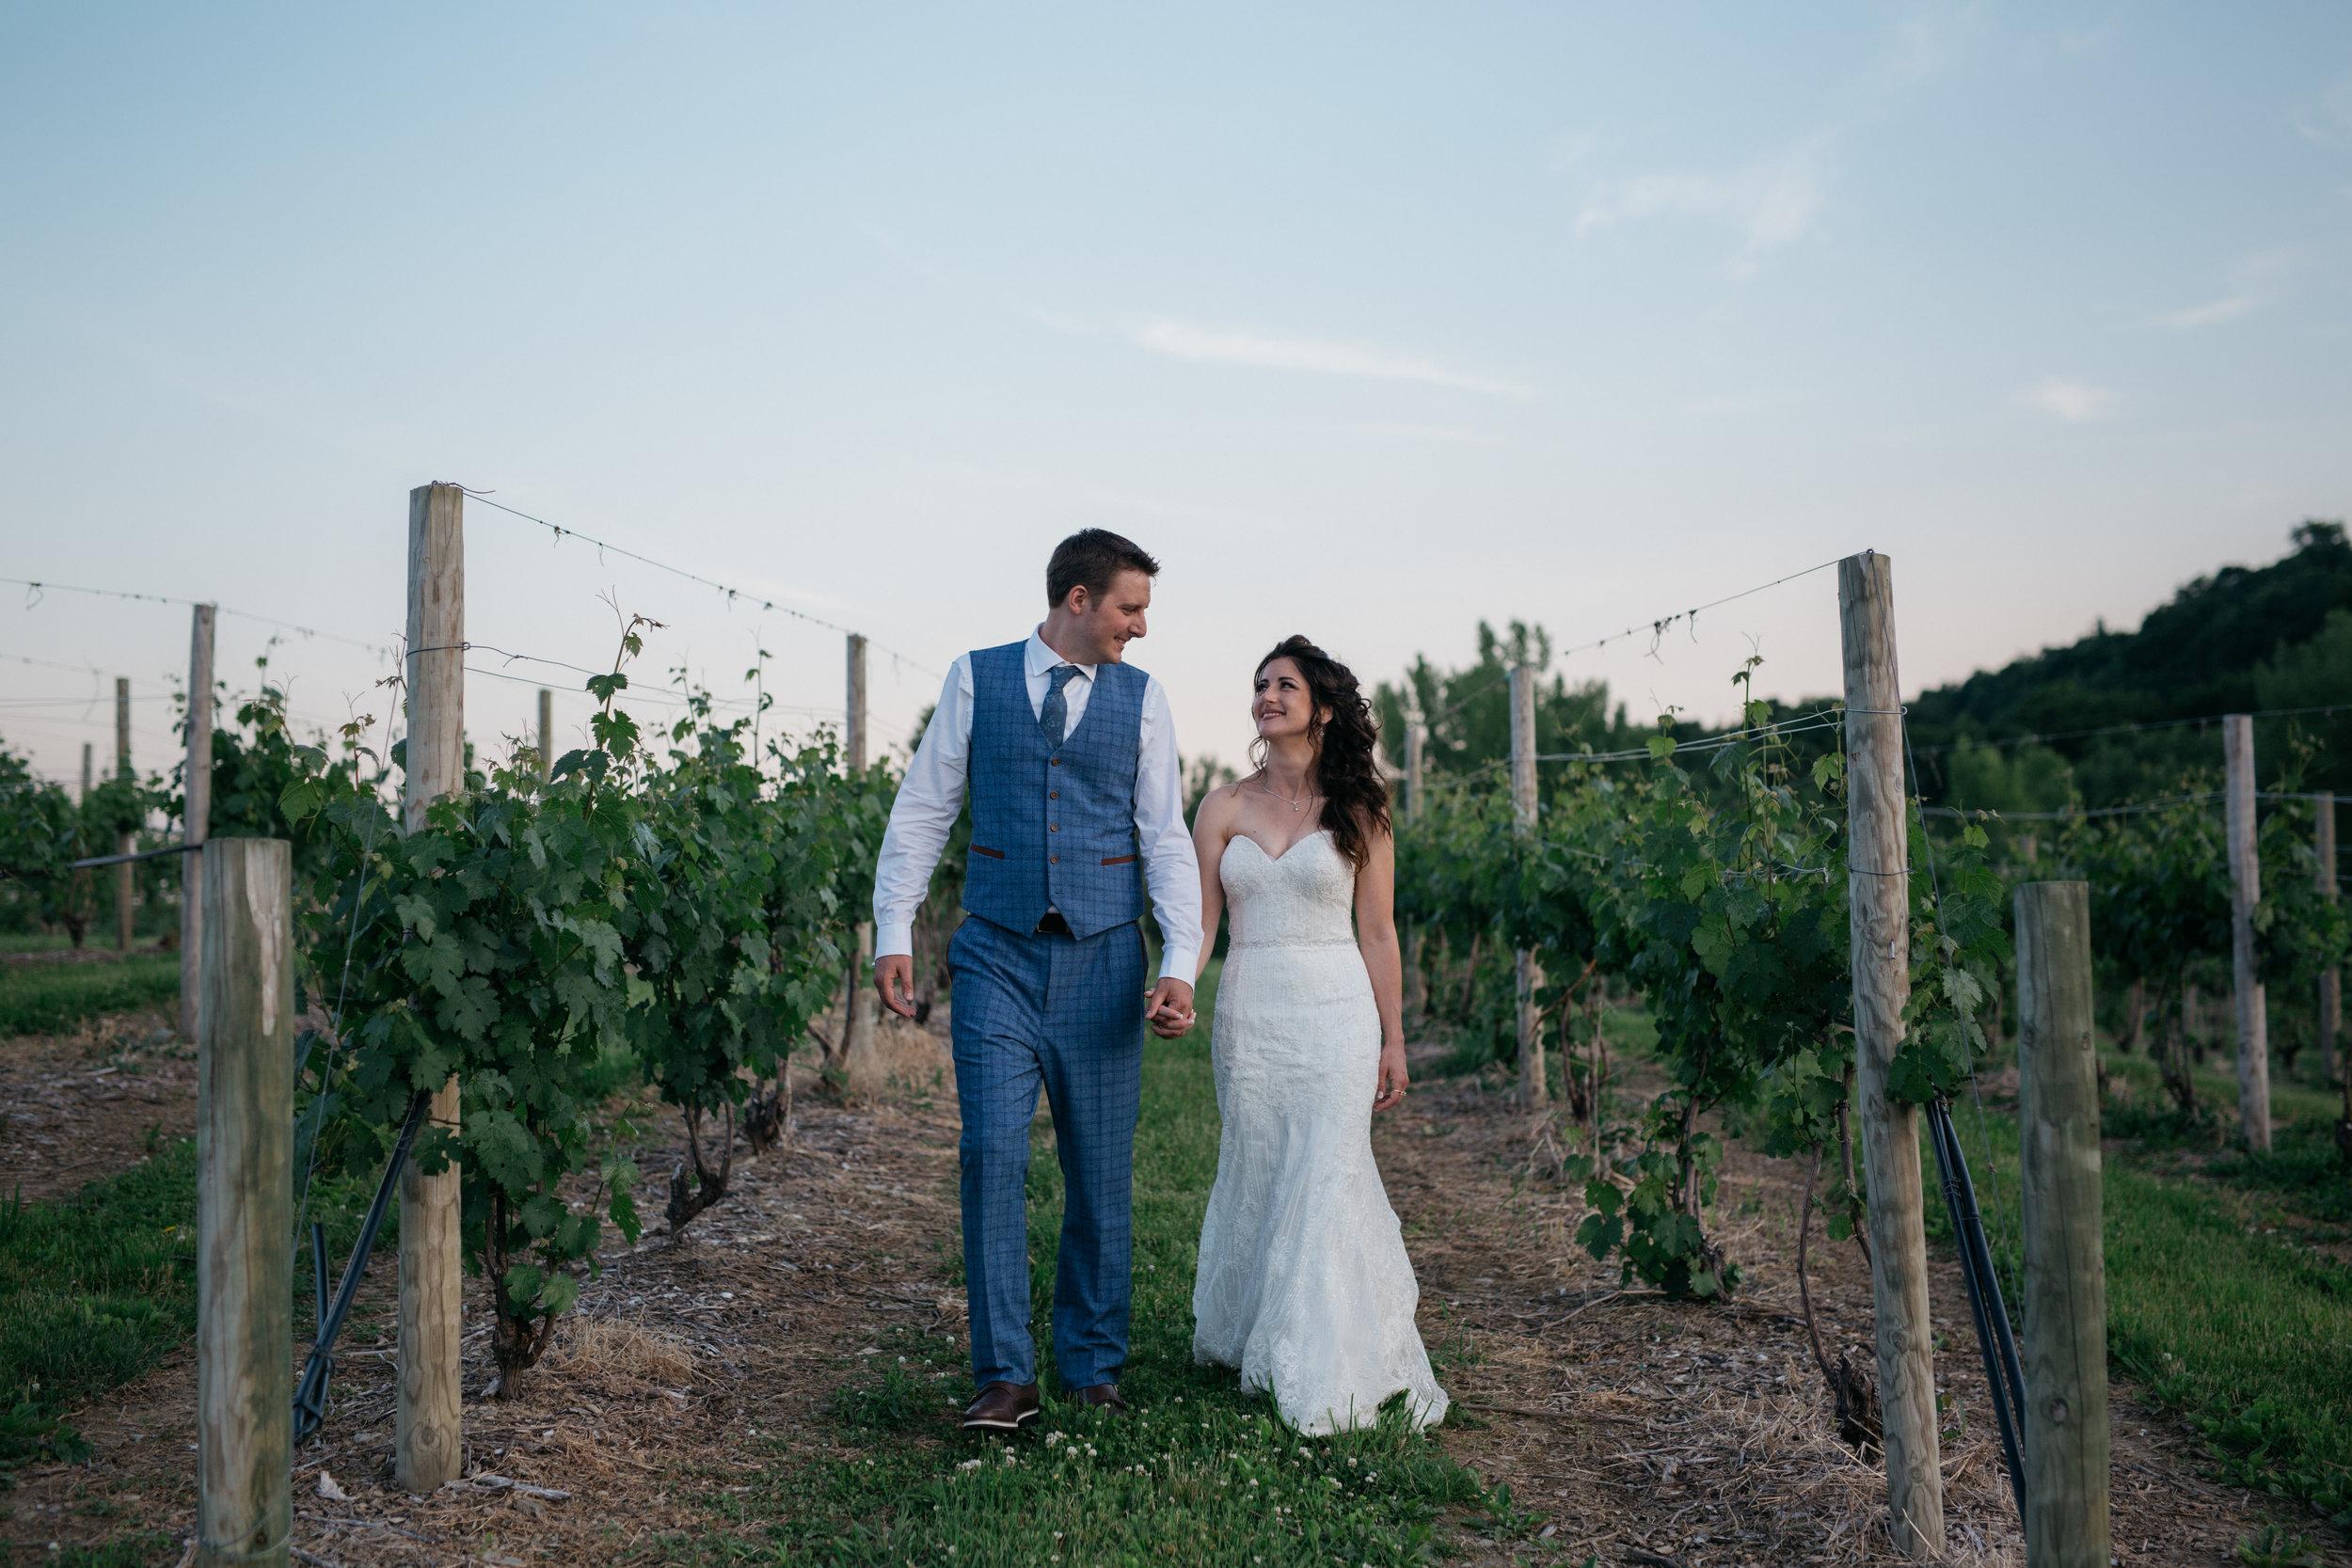 nostrano_vineyards_wedding_0078.JPG